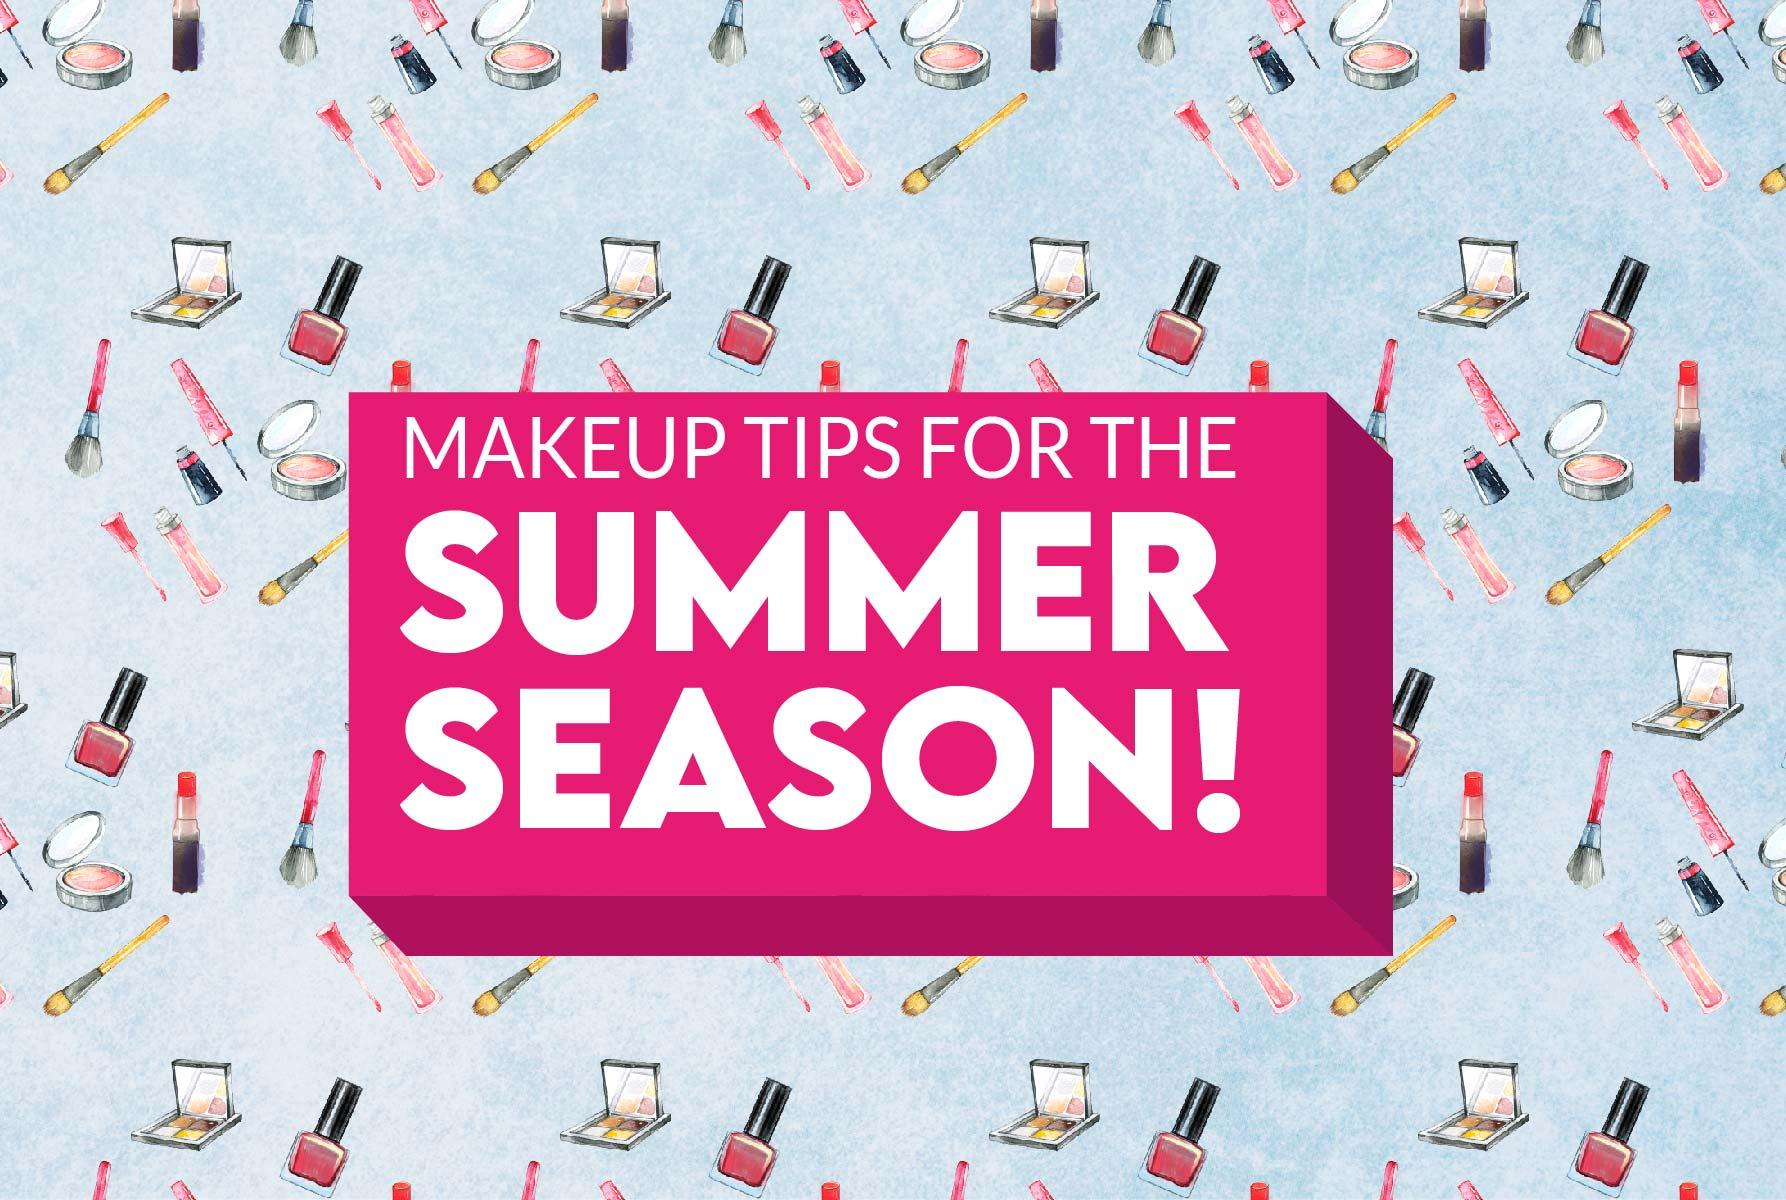 Makeup Tips for the summer season